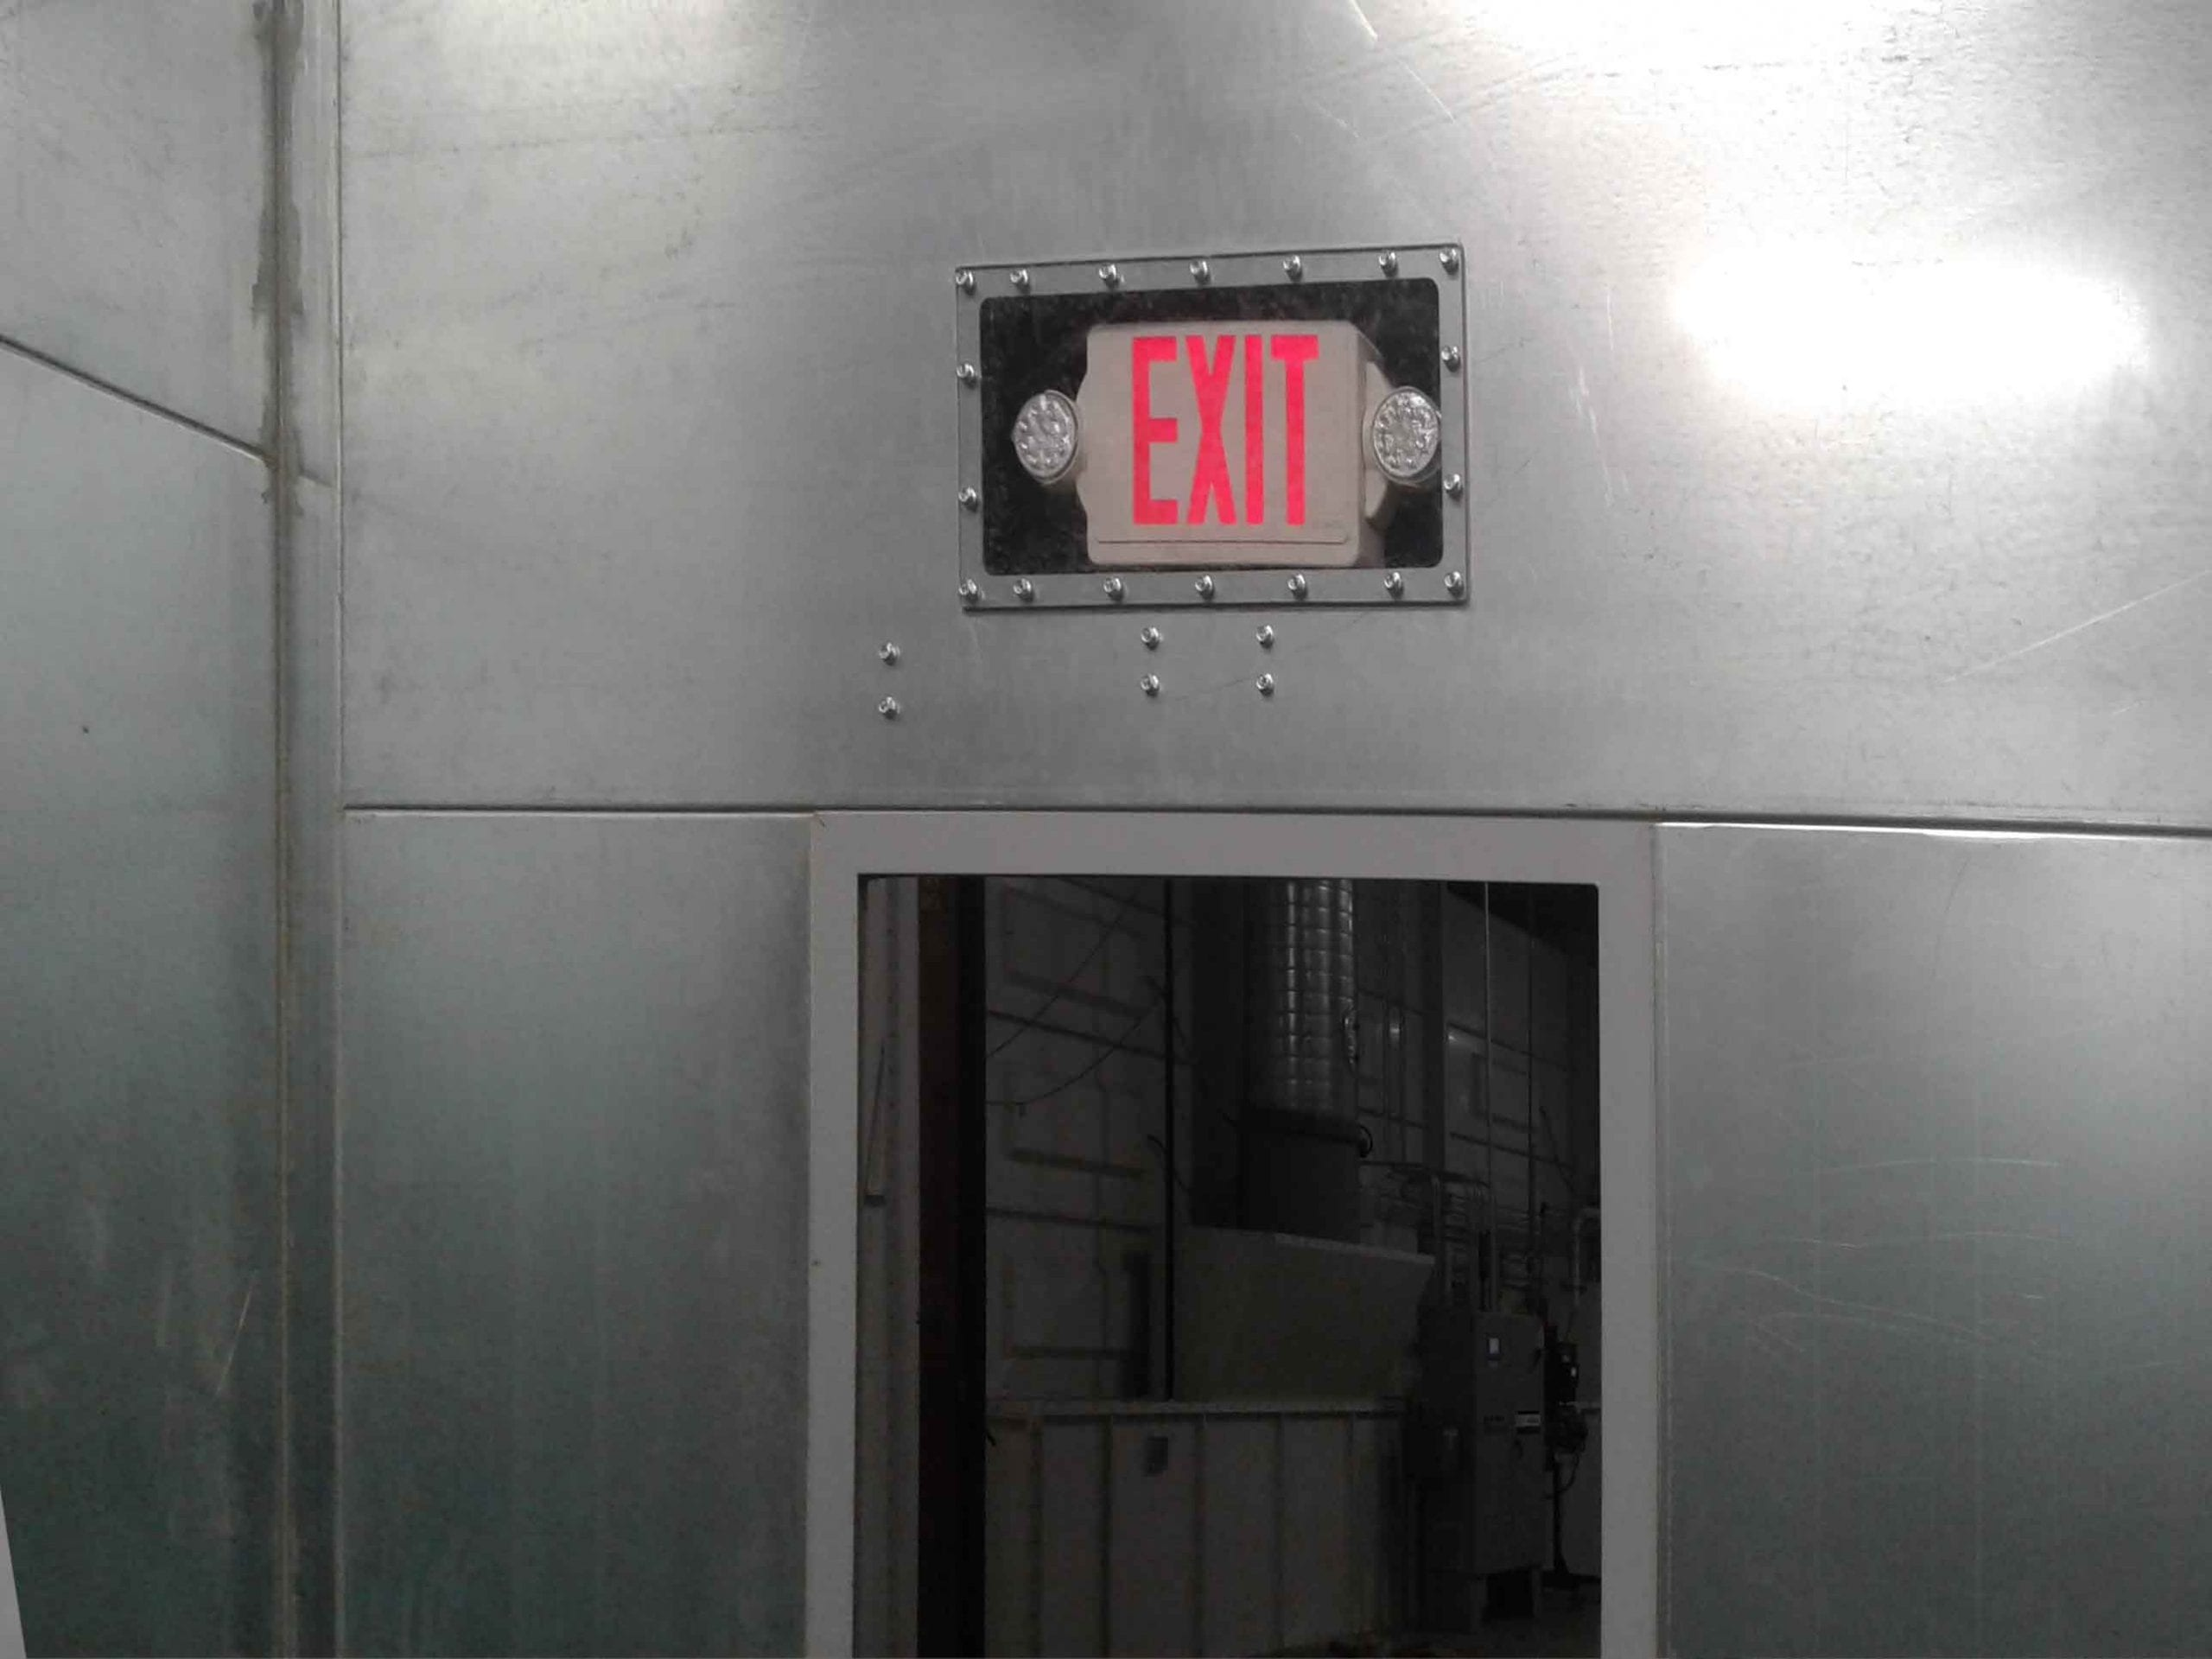 Illuminated Emergency Exit Sign on Sandblast Booth Personal Man Door